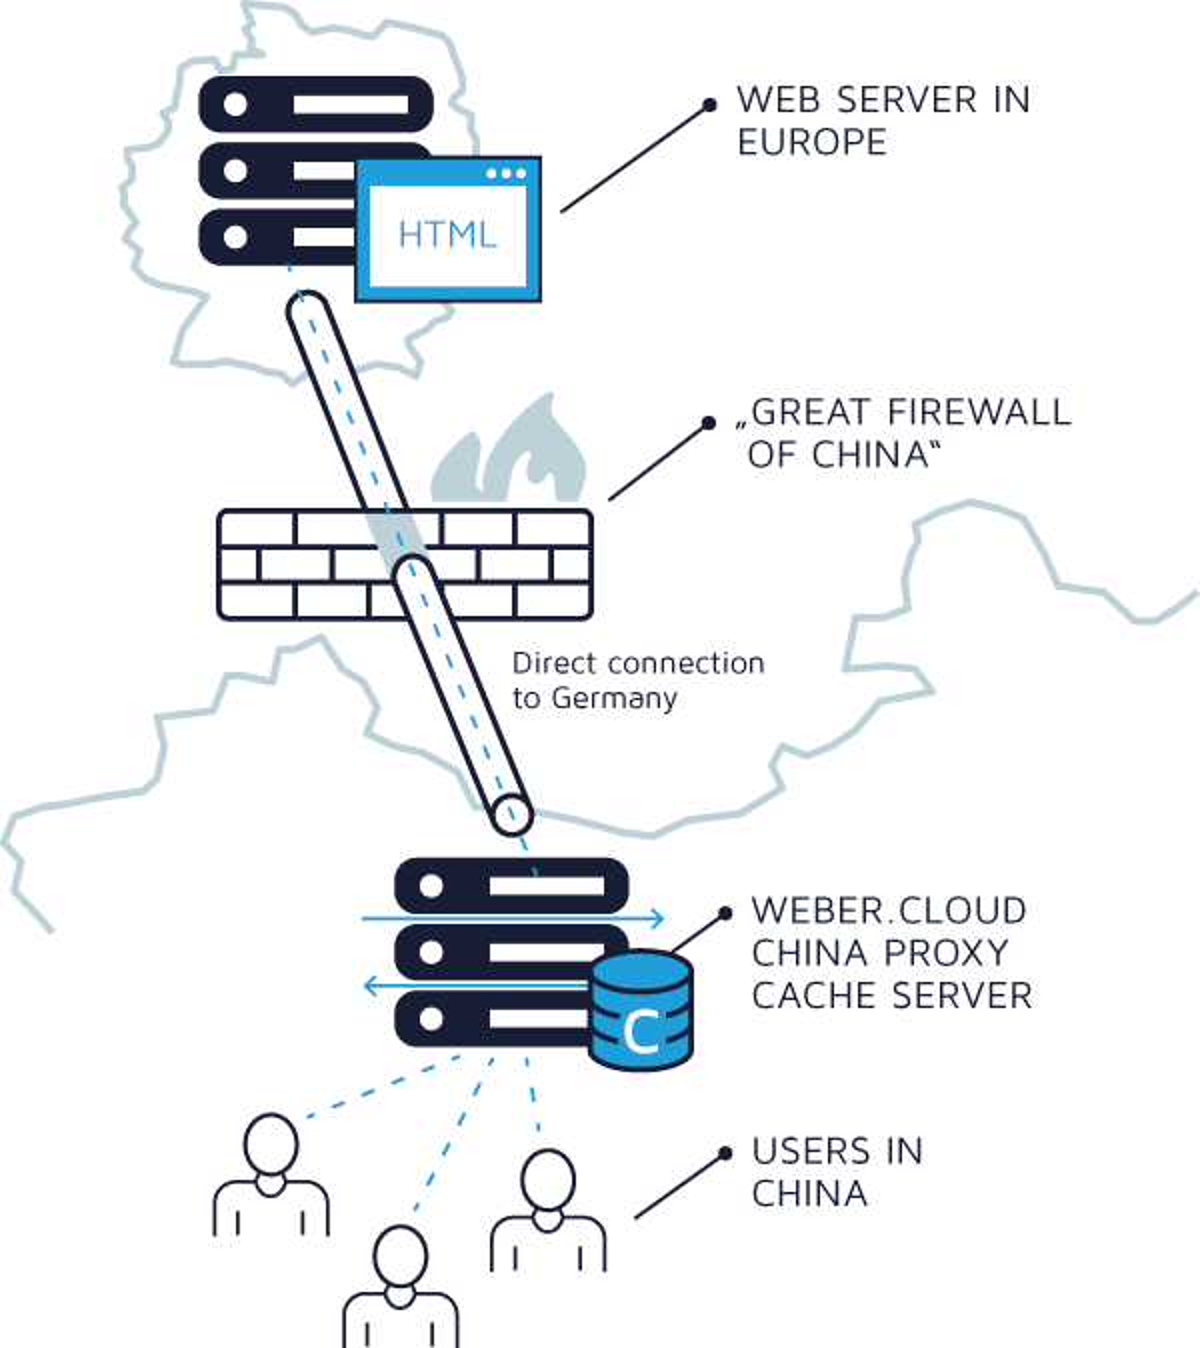 Proxy cache server in China